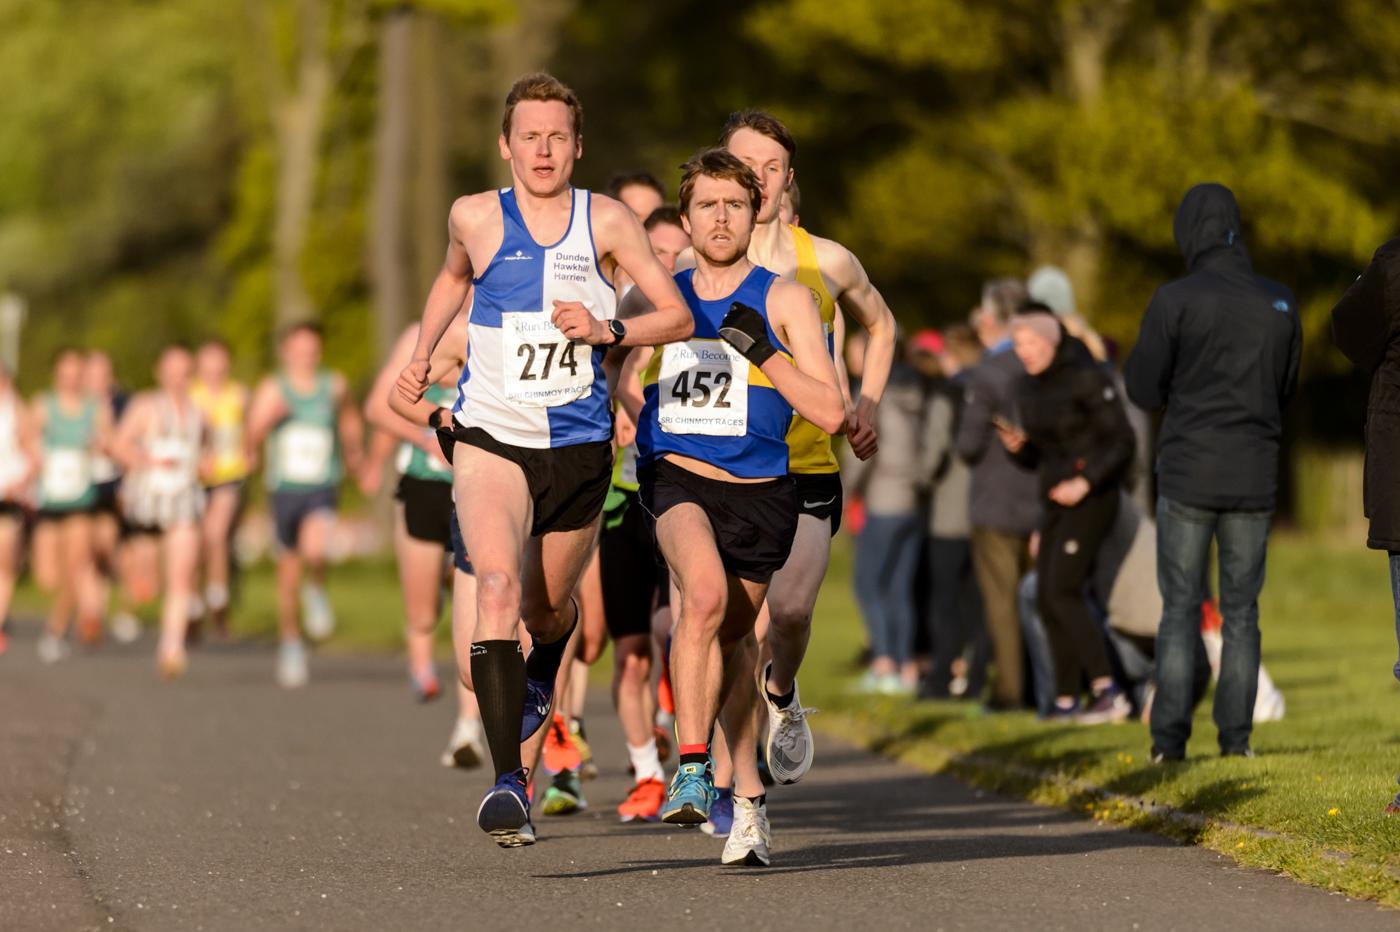 Nine athletes land shares in Road Race Grand Prix - Scottish Athletics